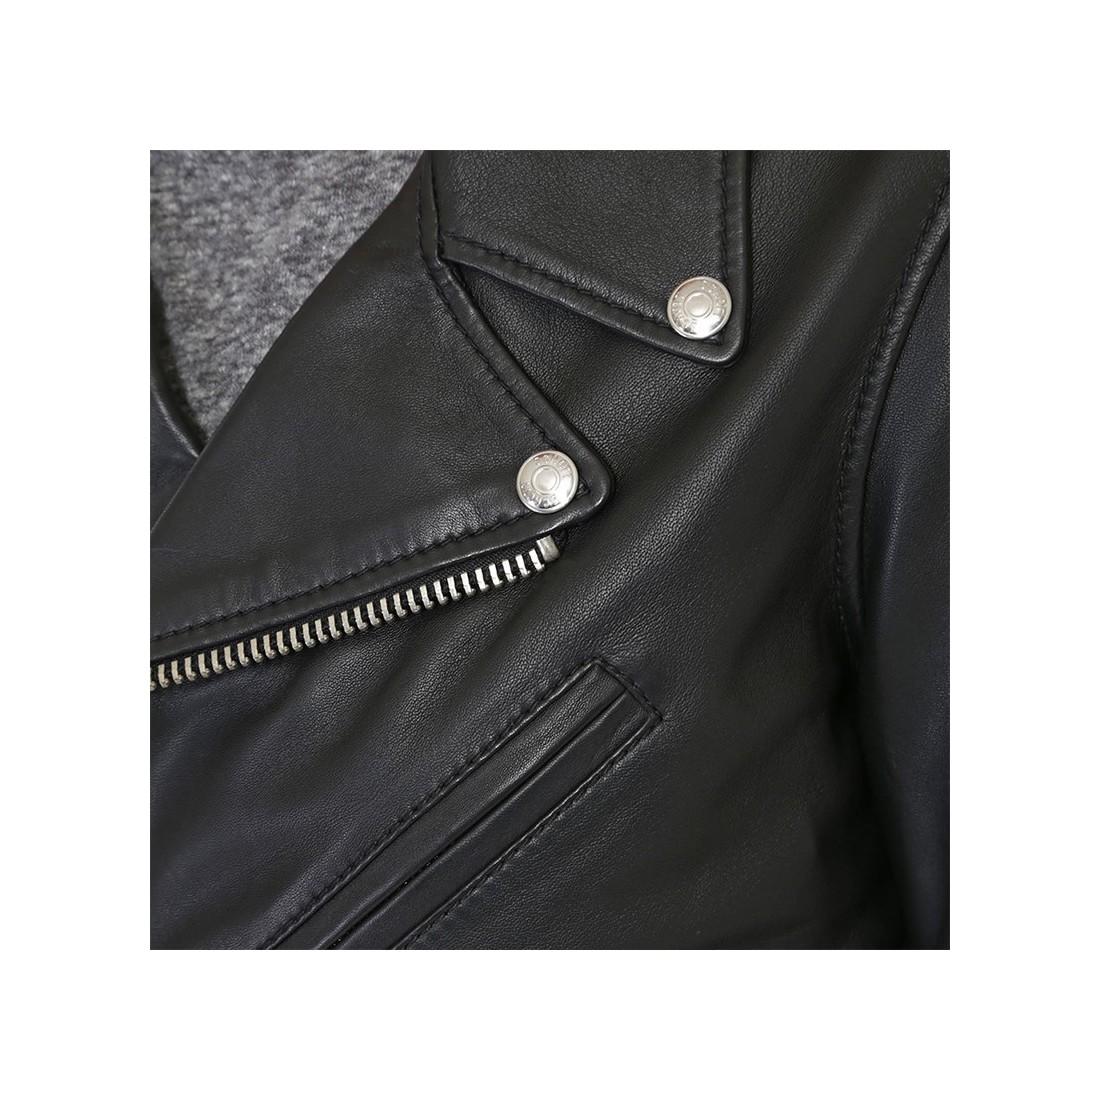 veste lcw1601d de schott en cuir femme noir. Black Bedroom Furniture Sets. Home Design Ideas